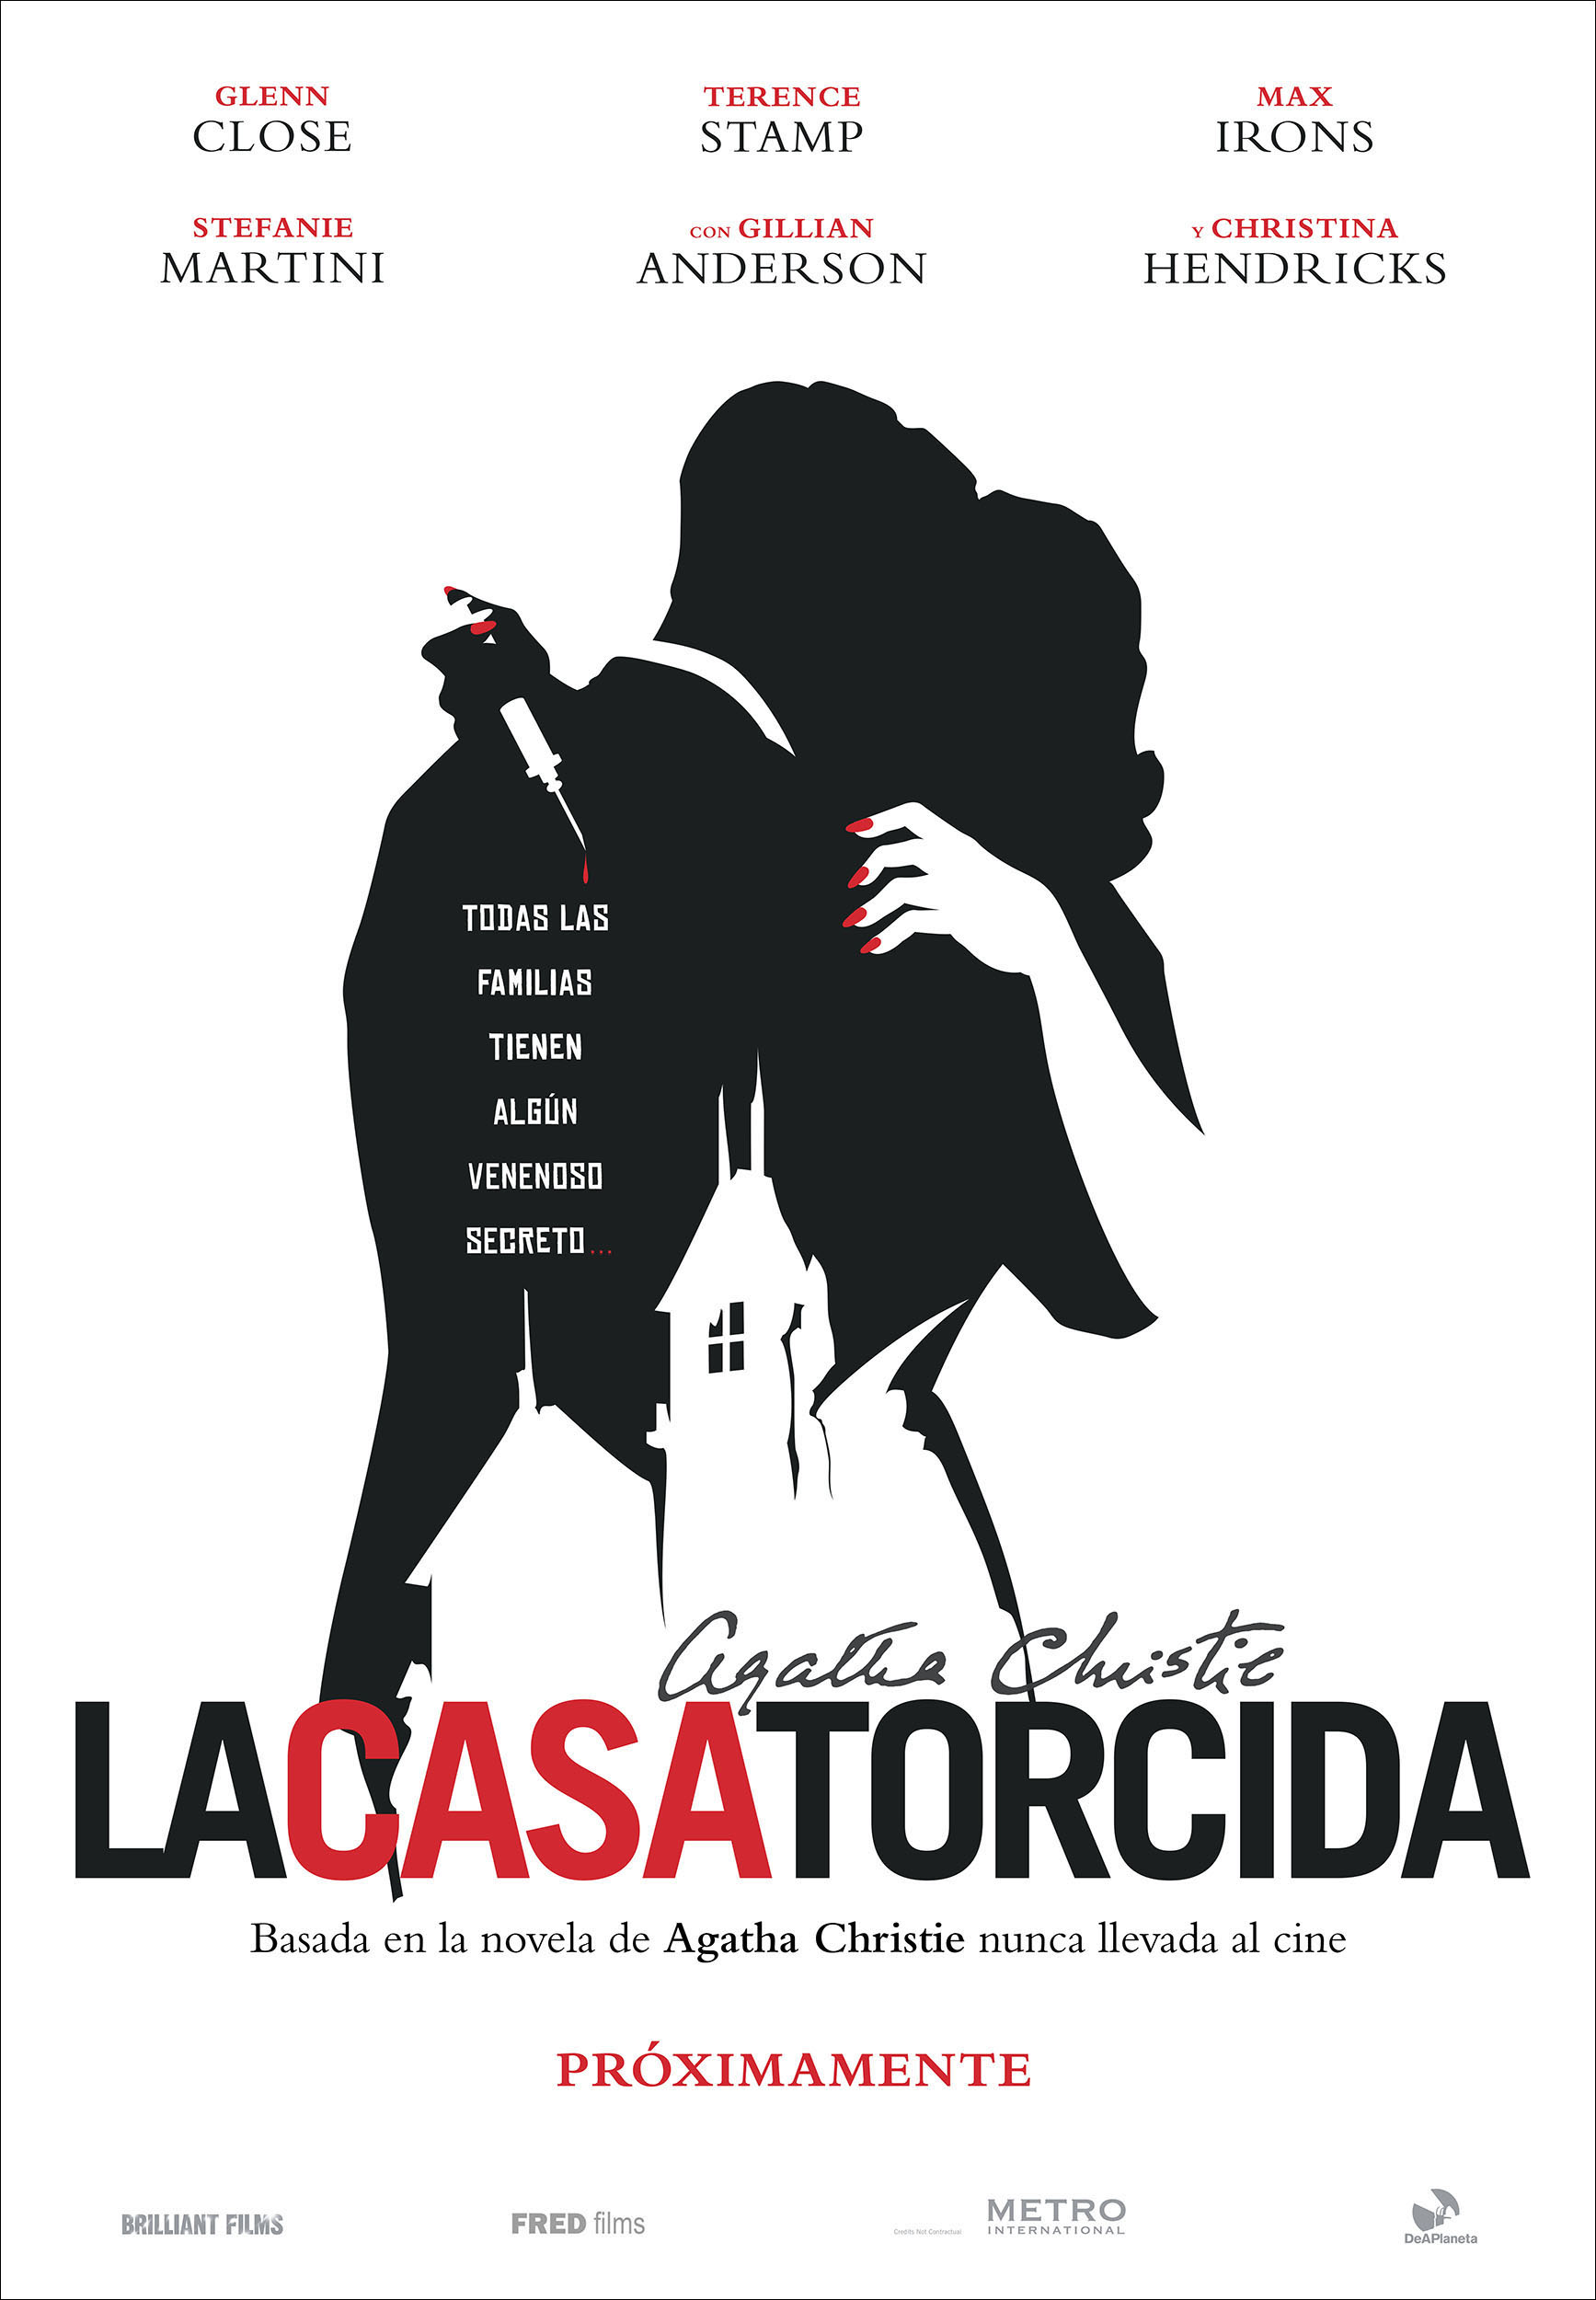 'La casa torcida': Teaser póster del thriller basado en la novela de Agatha Christie